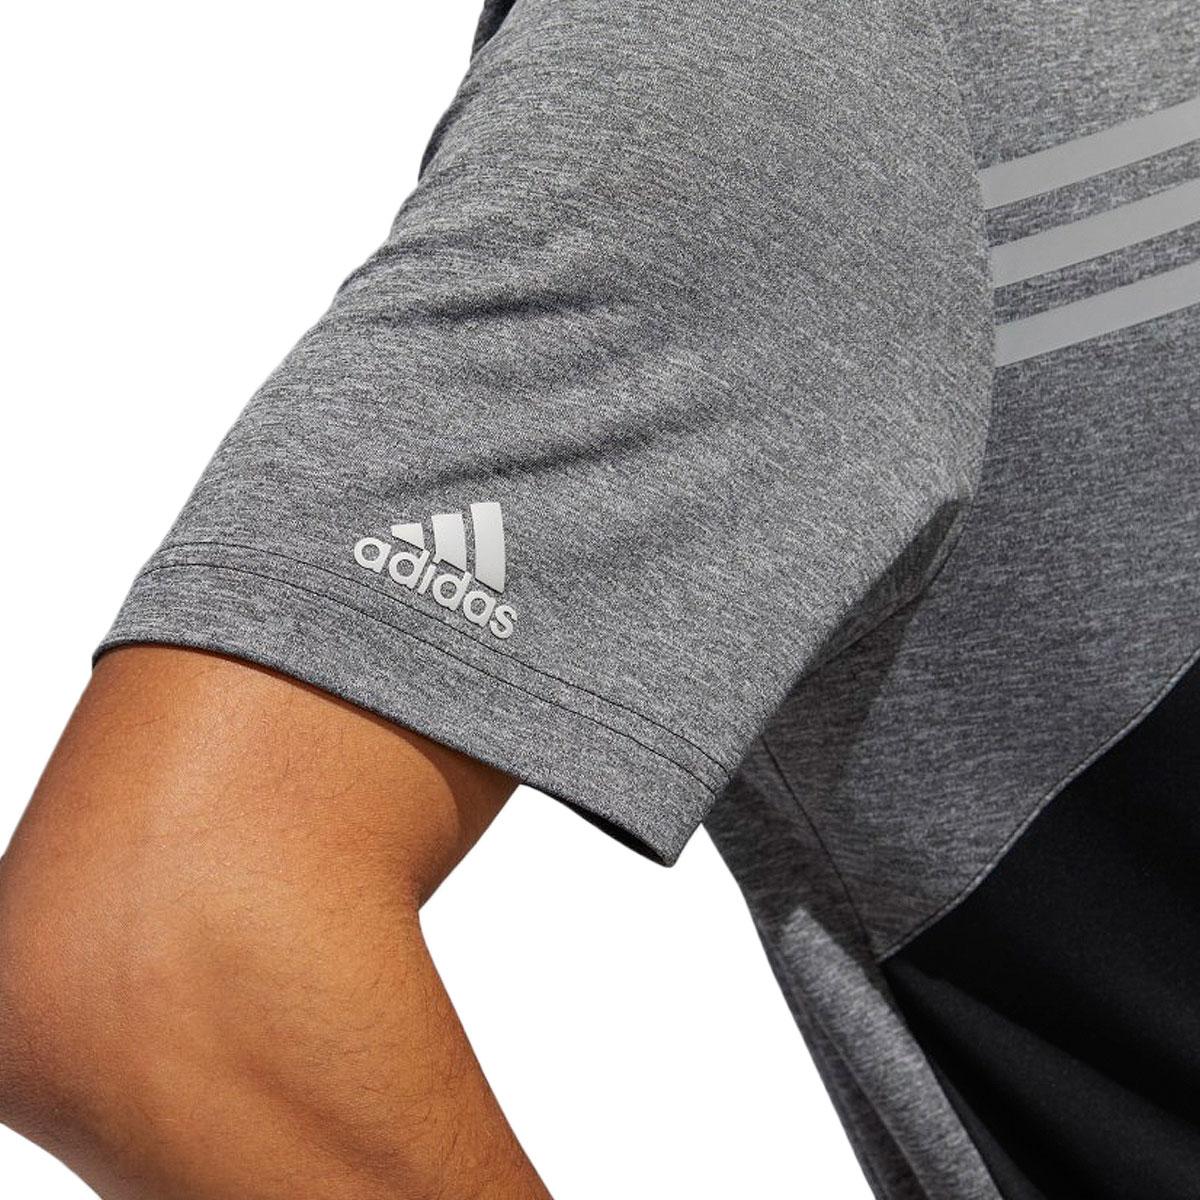 Adidas-Golf-Homme-3-Stripe-Heather-bloque-UPF-50-Polo-Shirt-43-off-RRP miniature 5